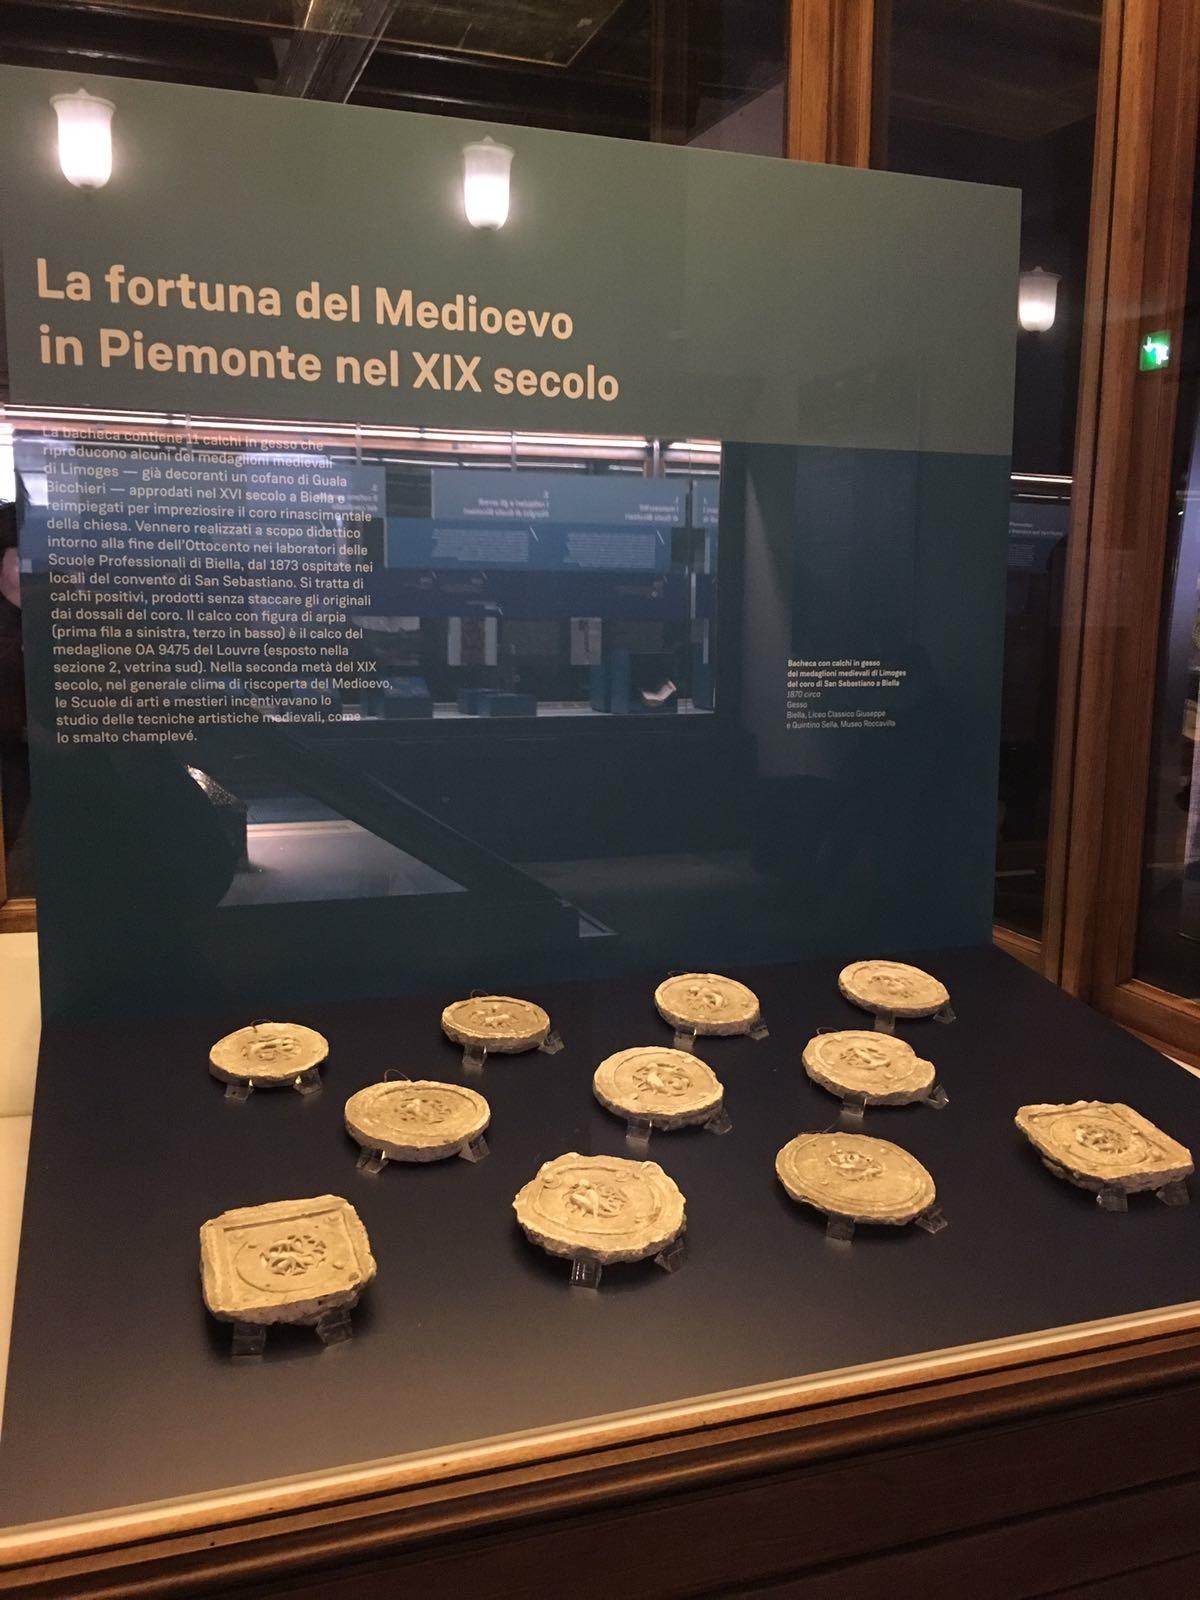 http://www.museoroccavilla.eu/images/Immagini/ImmaginiArticoli/IMG-20161117-WA0005.jpg